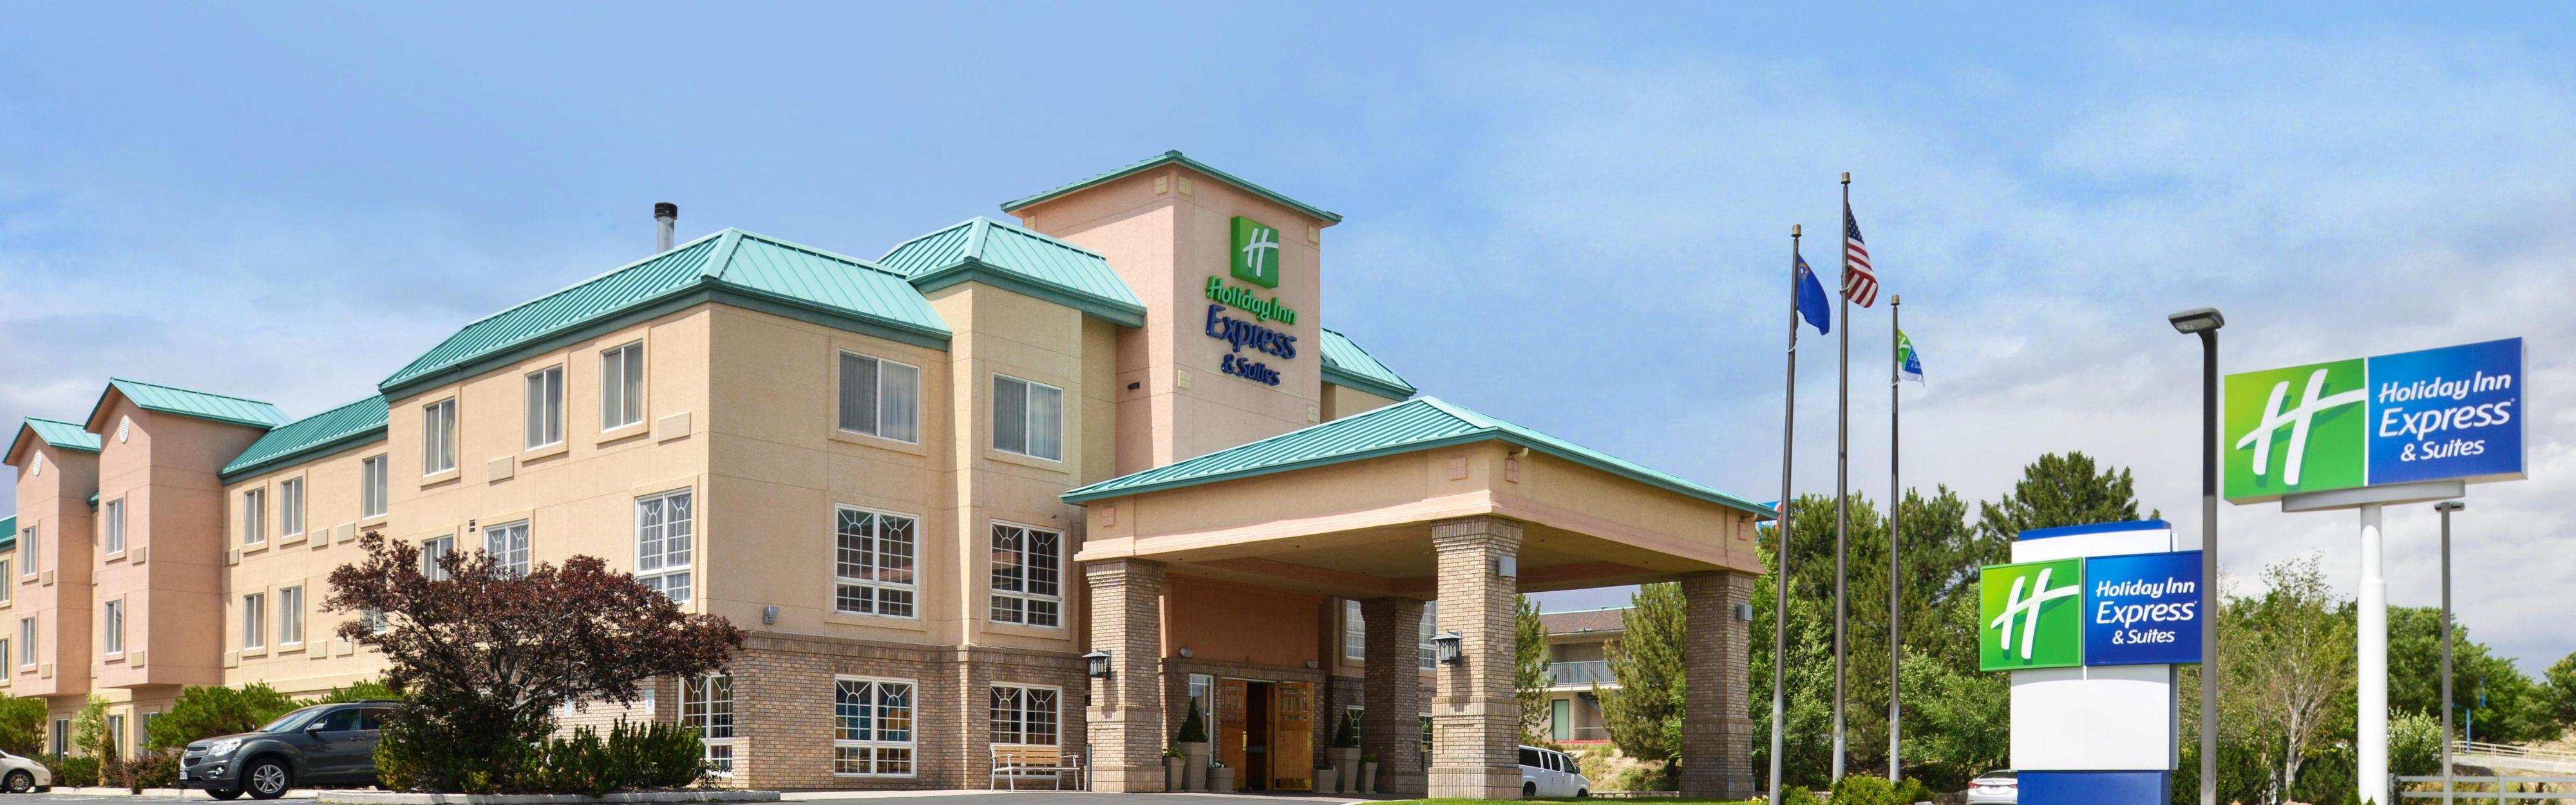 Holiday Inn Express & Suites Elko image 0